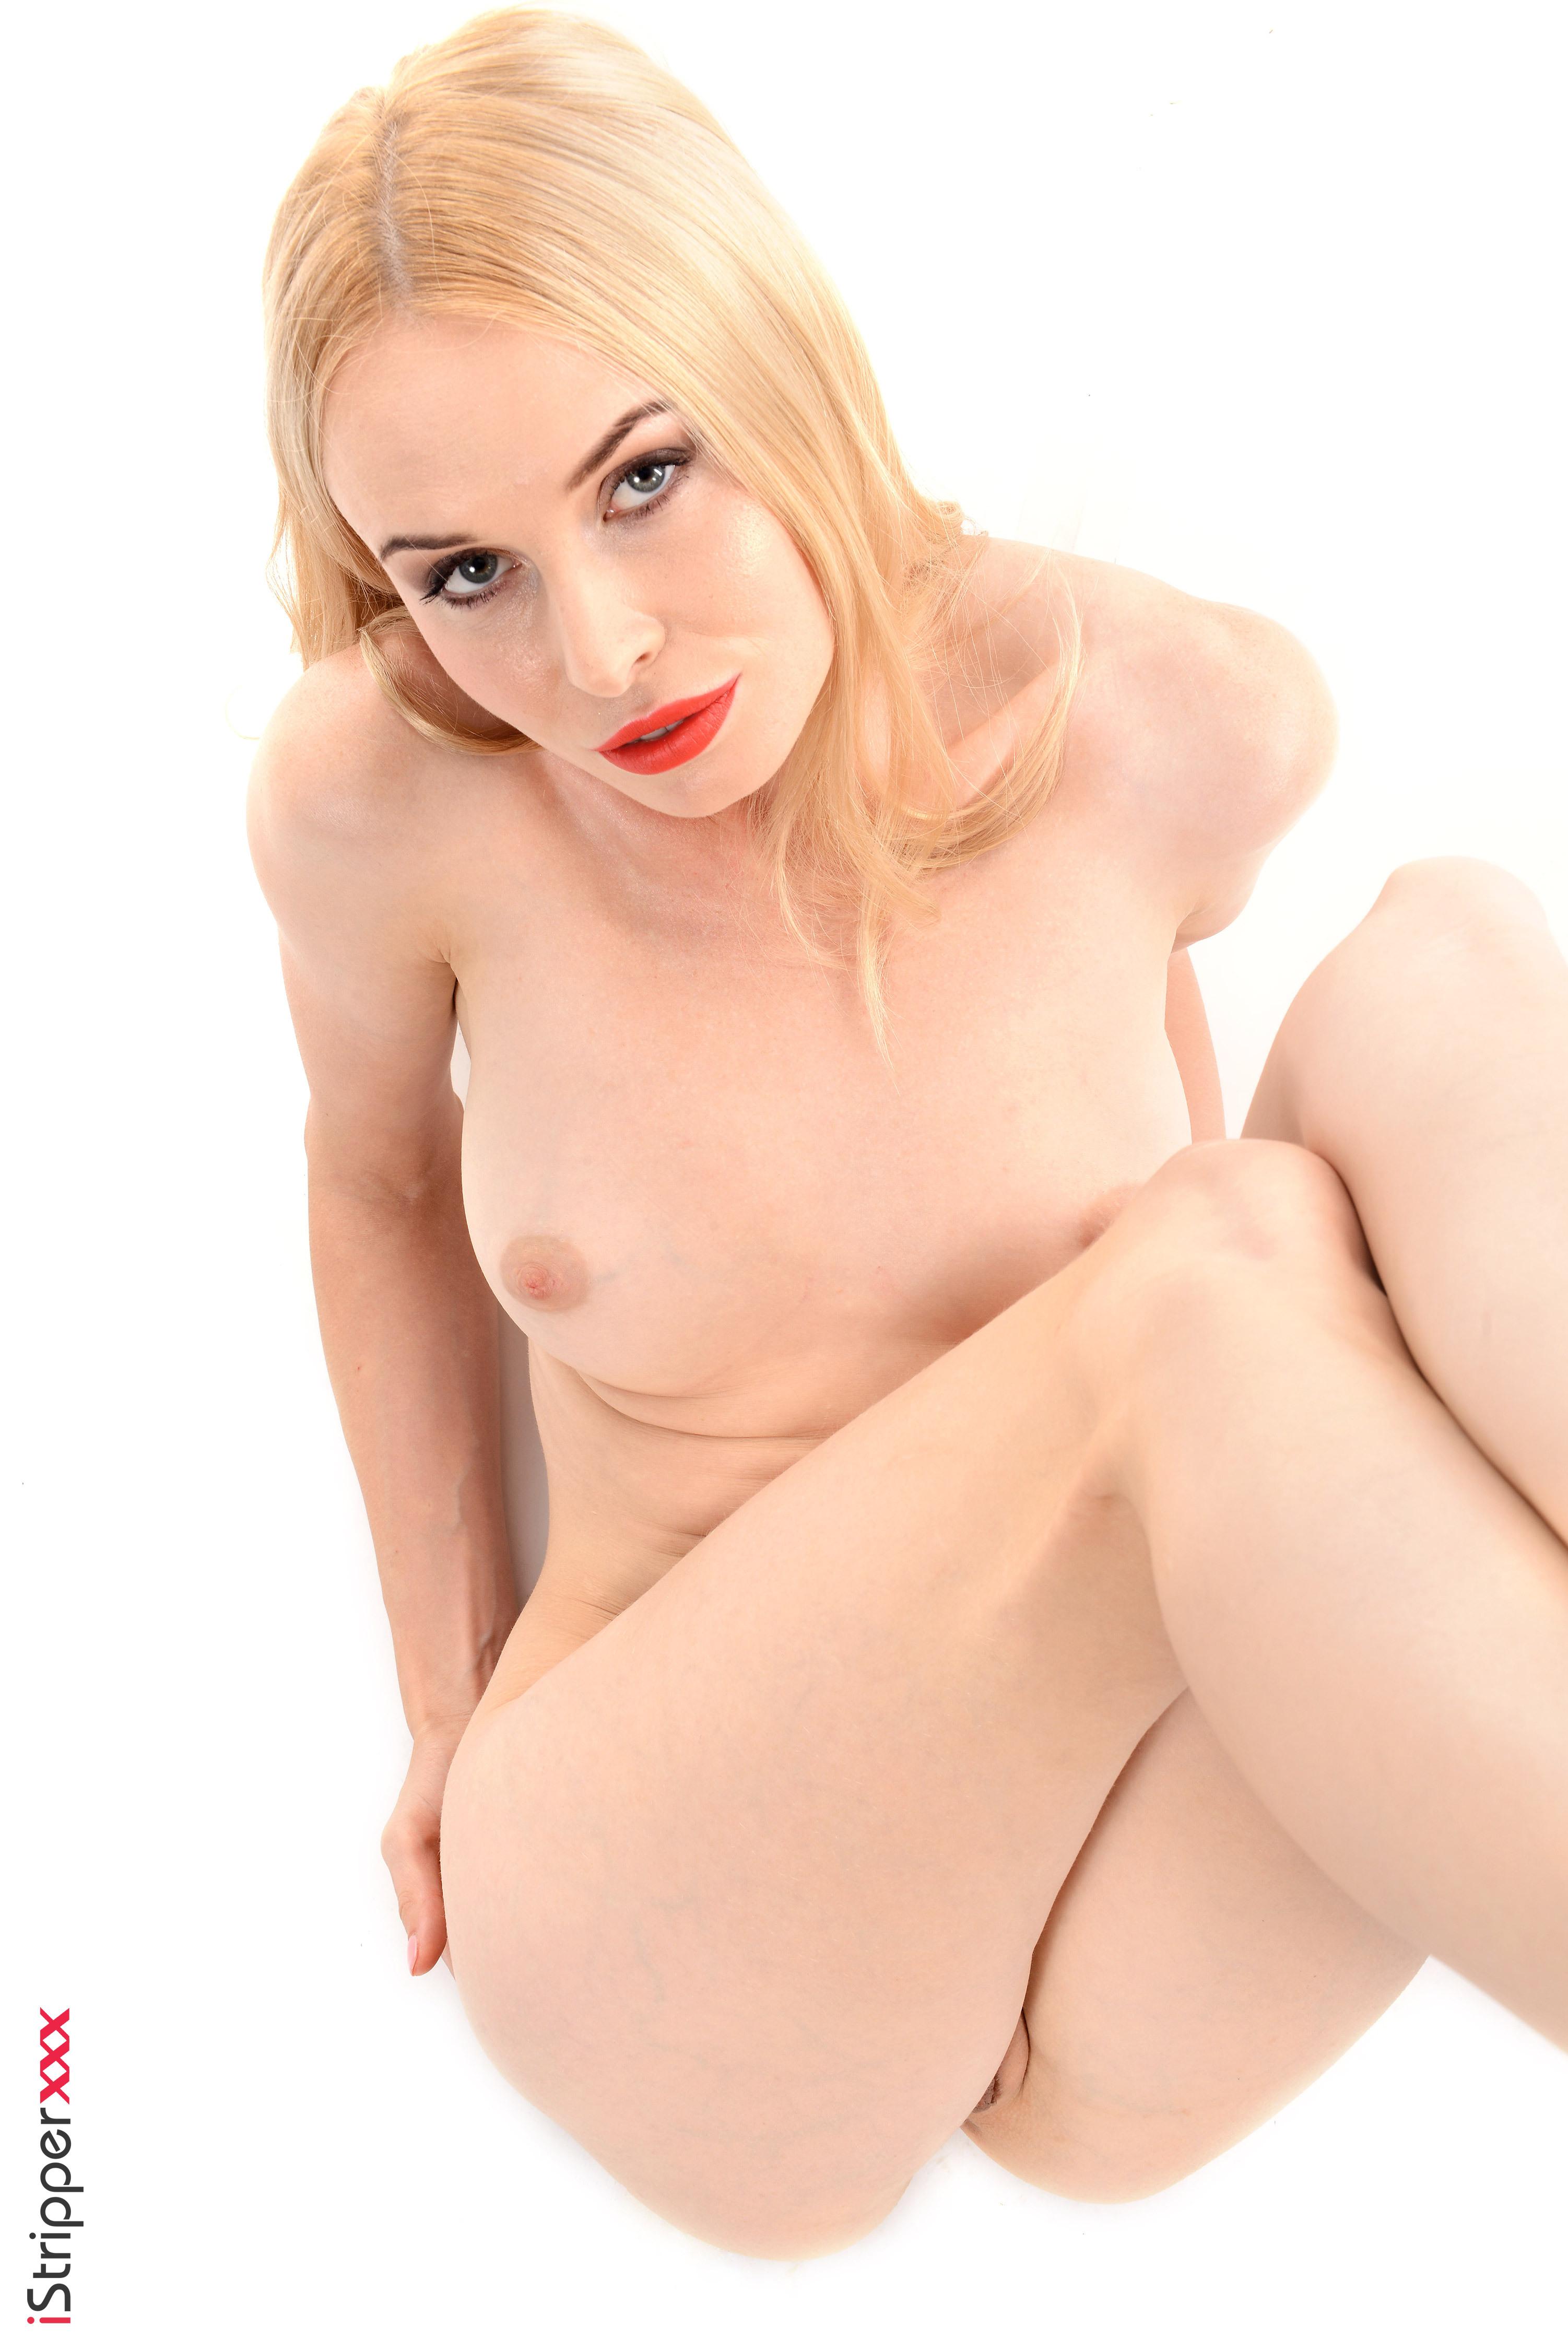 blad pussy pics